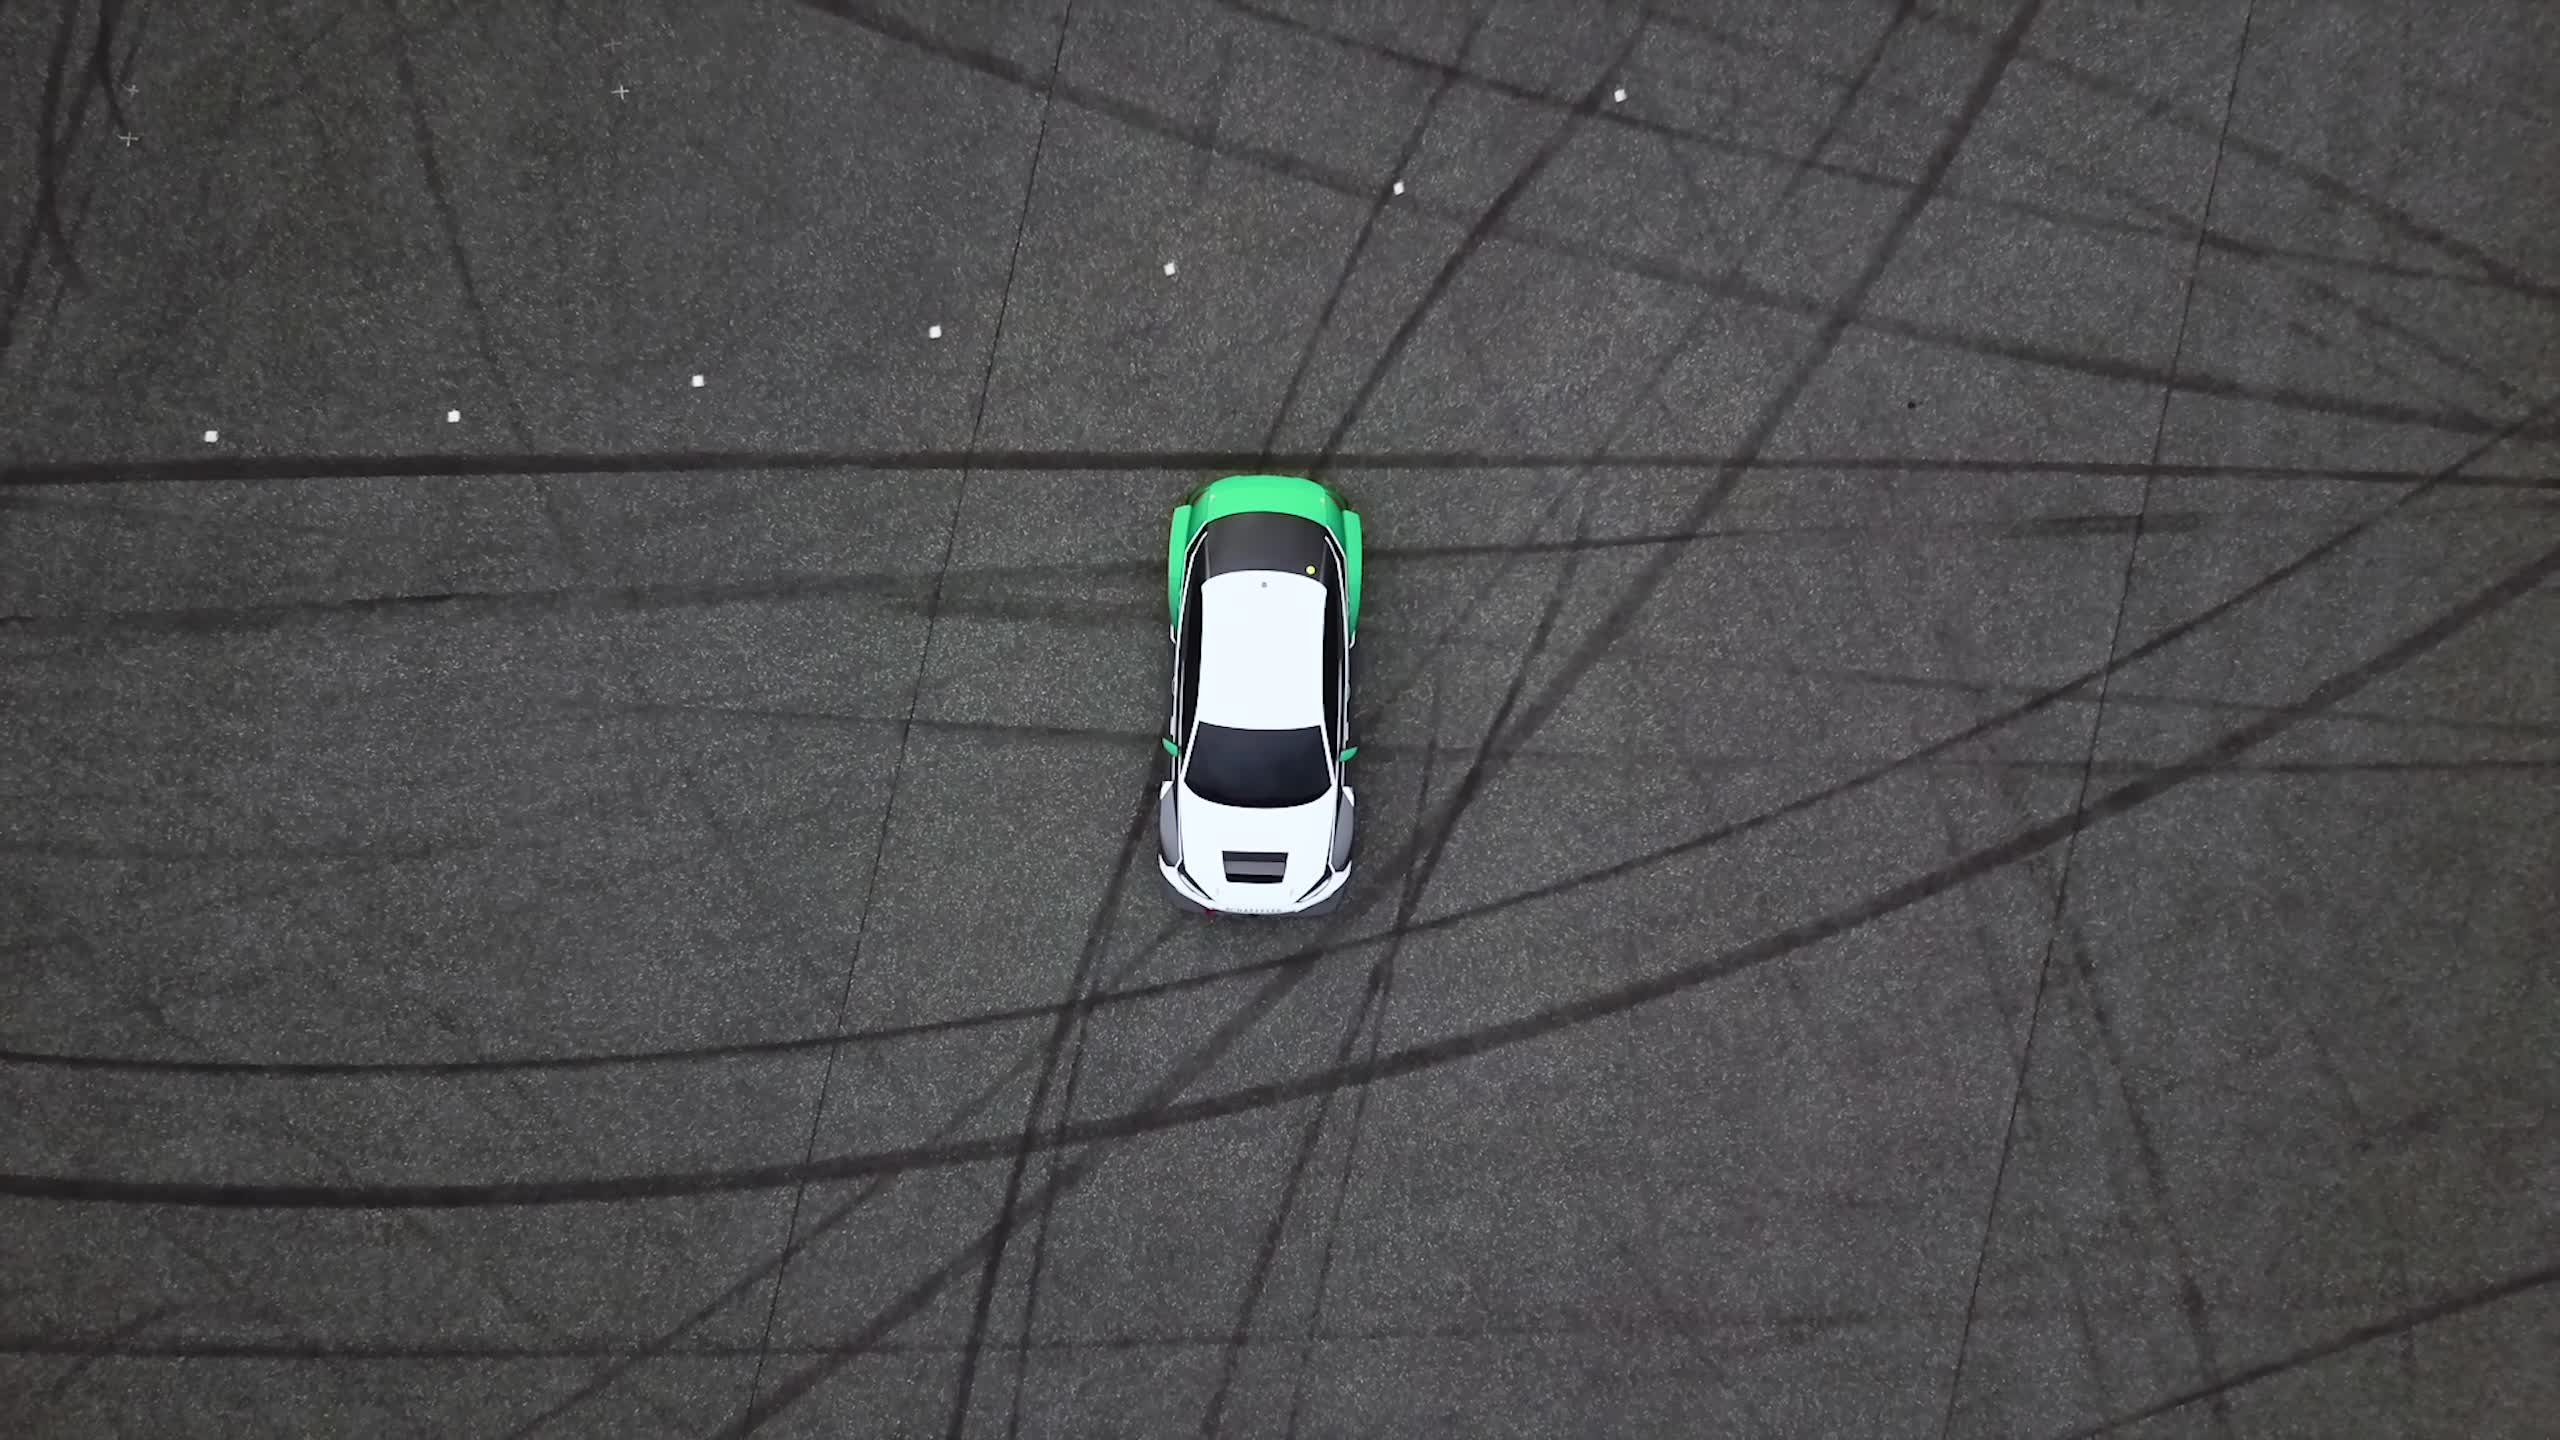 1200PS, 1200PS S4eP, Audi, Audi RS3, Elektroauto, S4eP, Schaeffler 4e, beschleunigung, elektromotor, schaeffler 4eperformance, audi GIFs